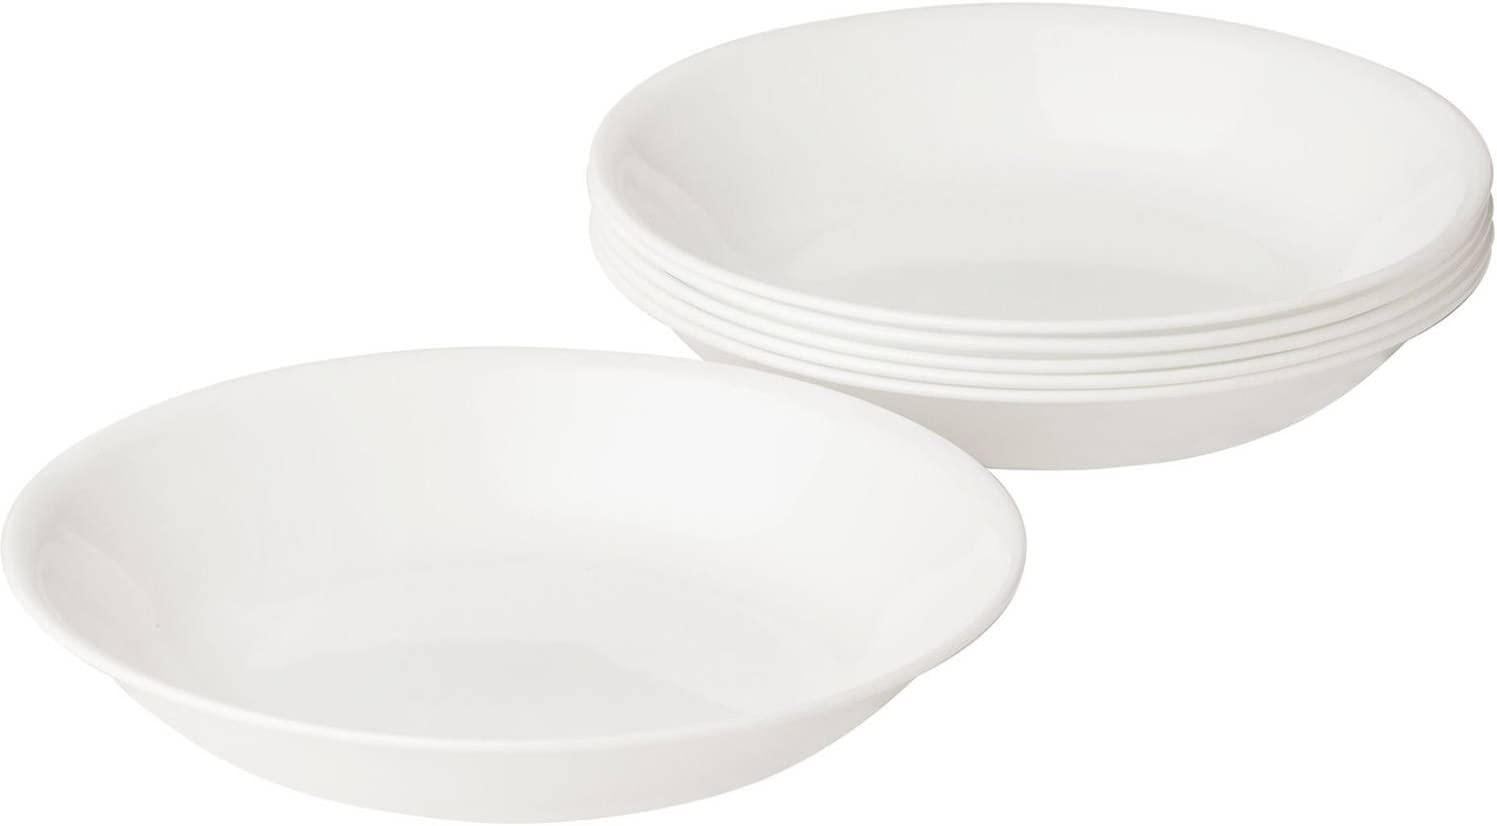 Corelle Livingware Winter Frost White 20-oz Pasta Bowls Set of 6